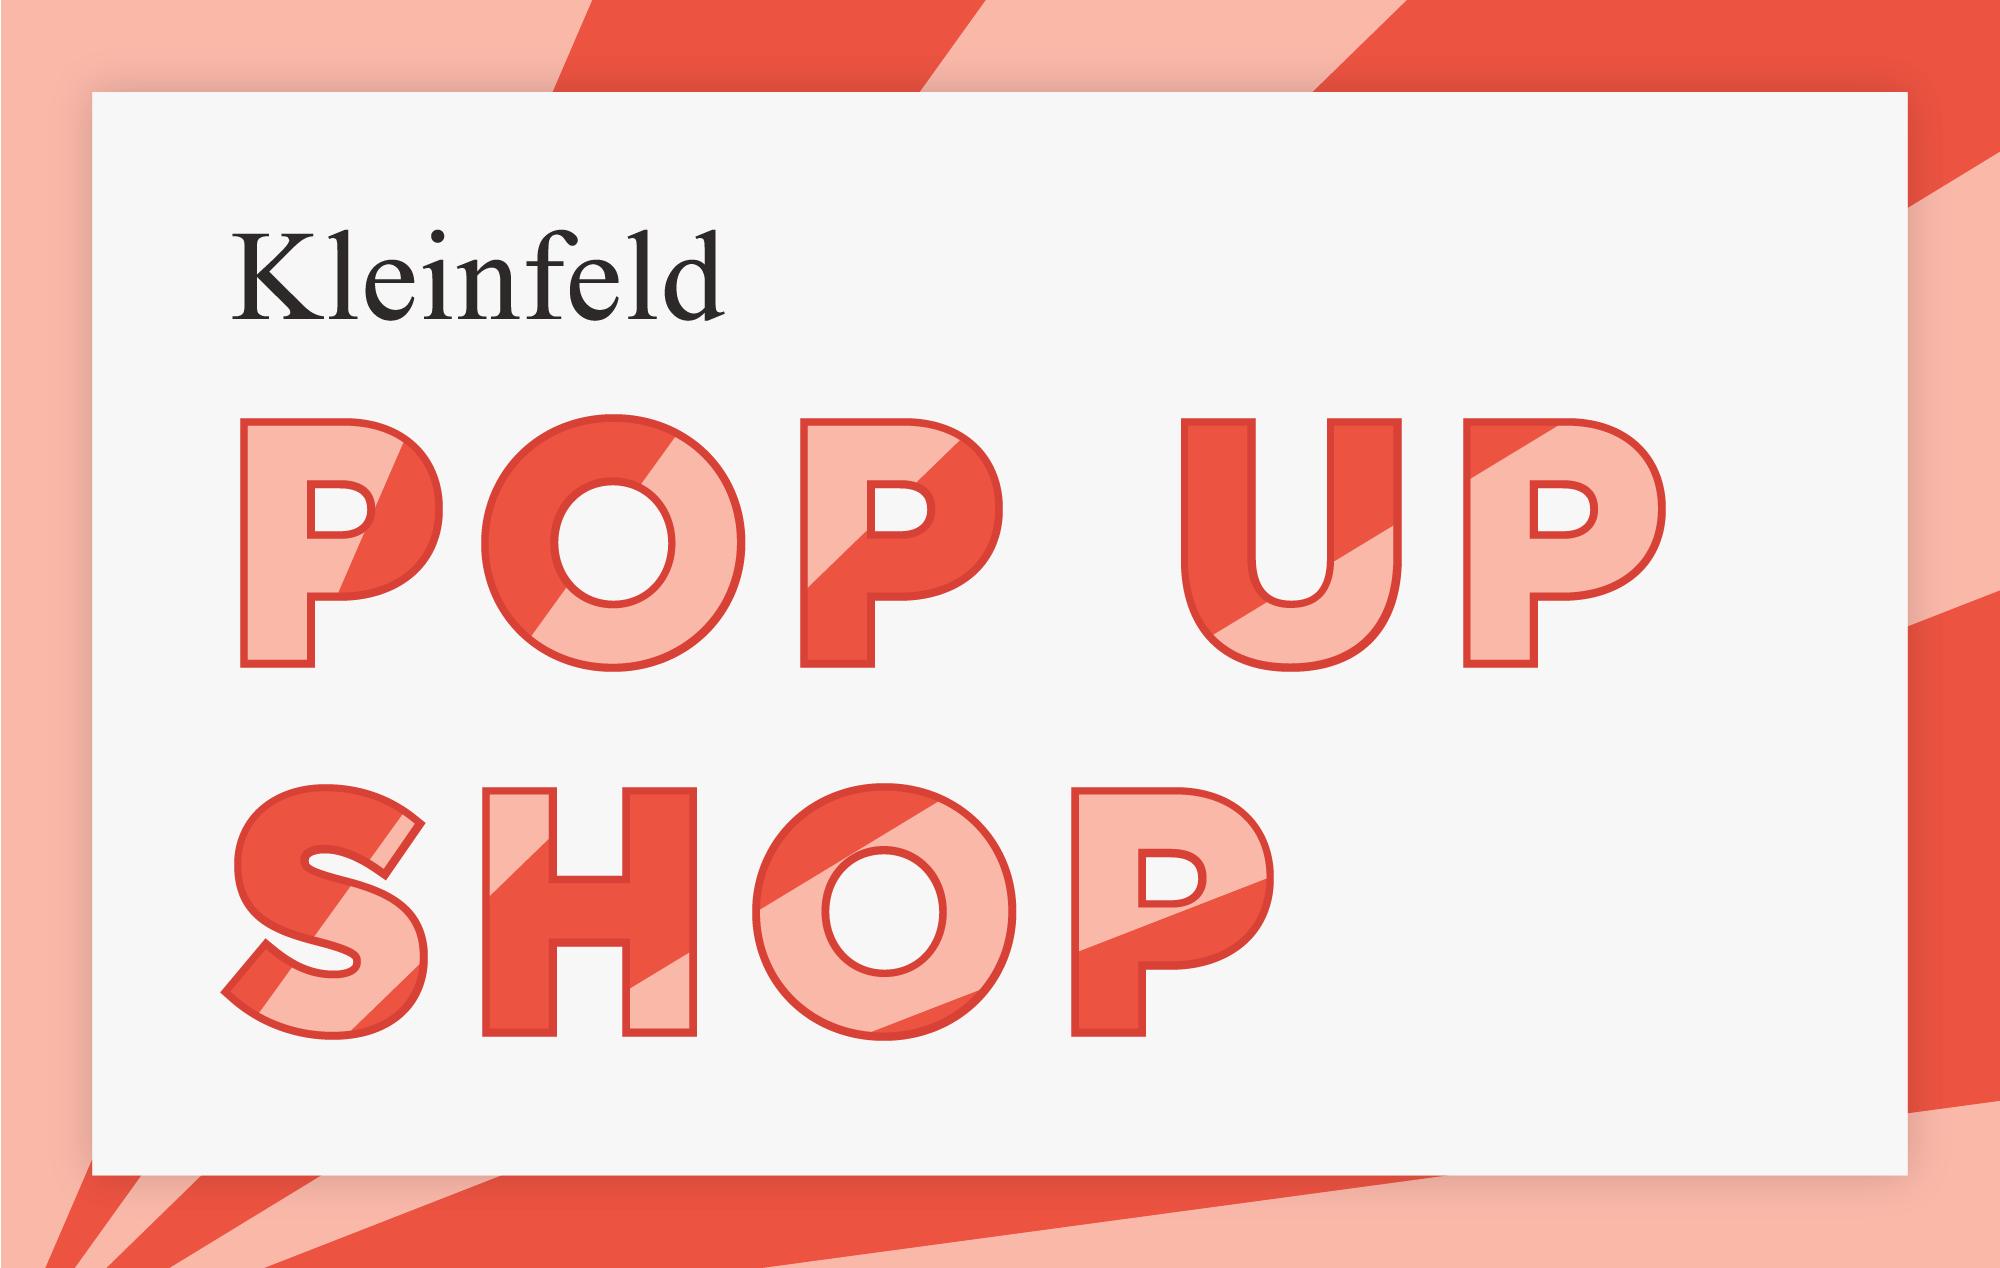 KF_Pop Up Shop_Landing page